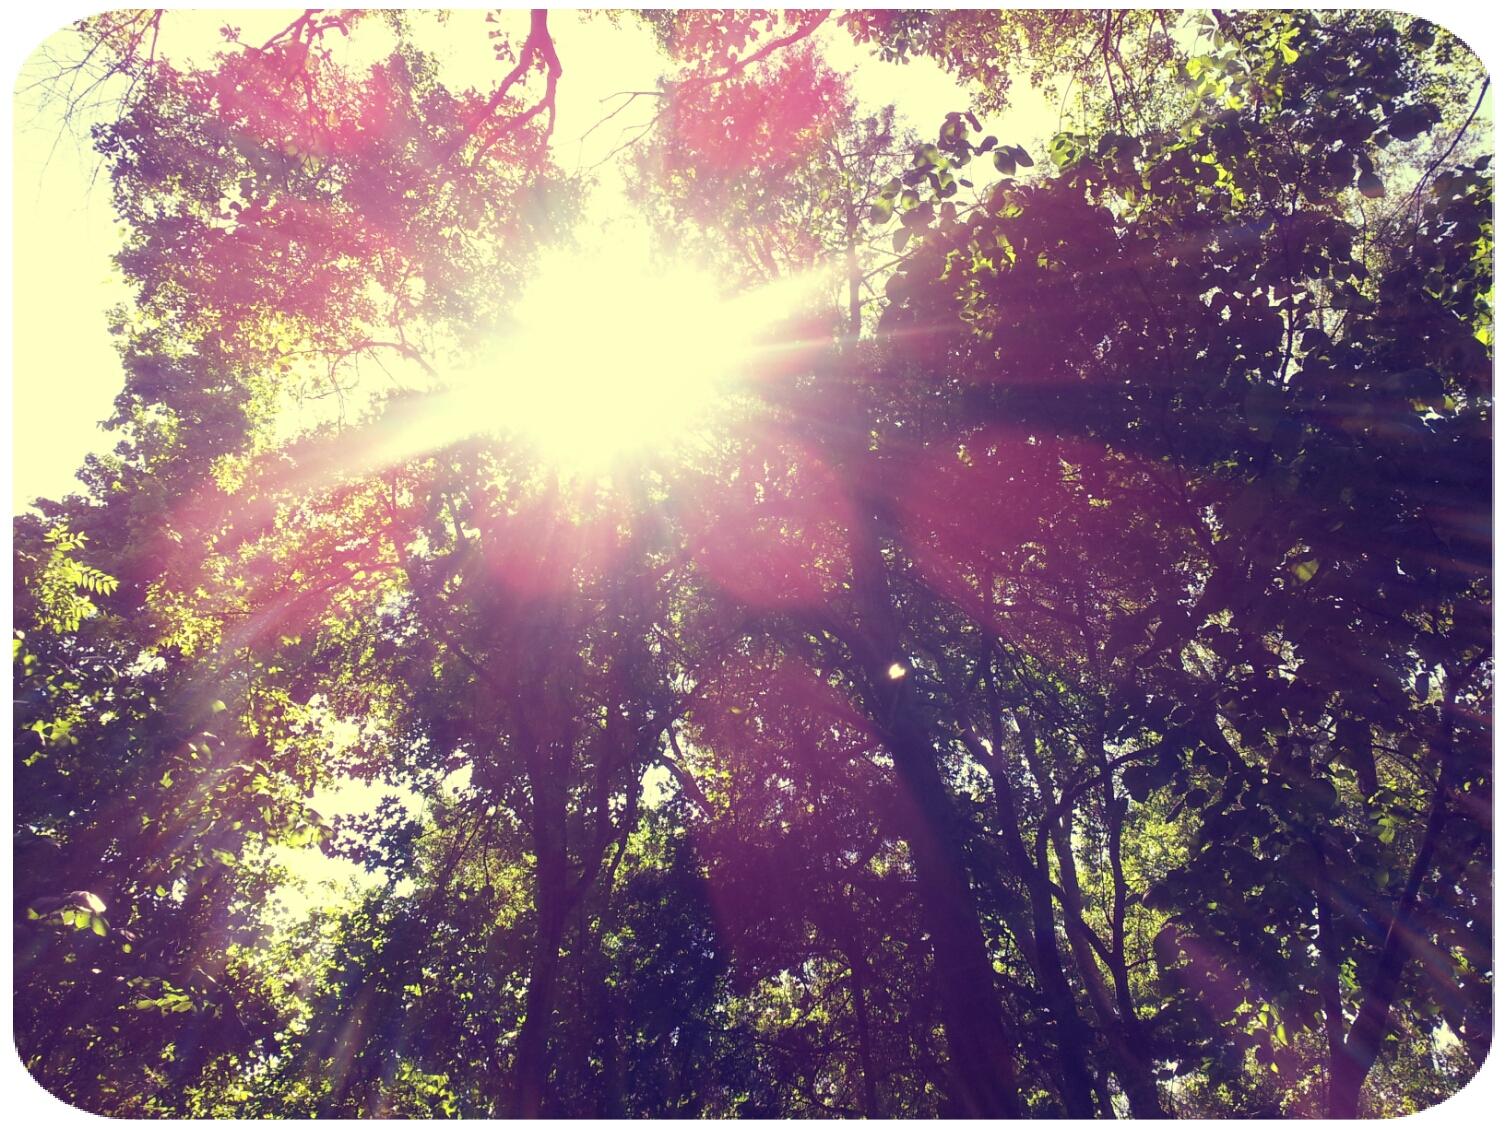 2012-04-23 15.14.28_Roxy_Round.jpg